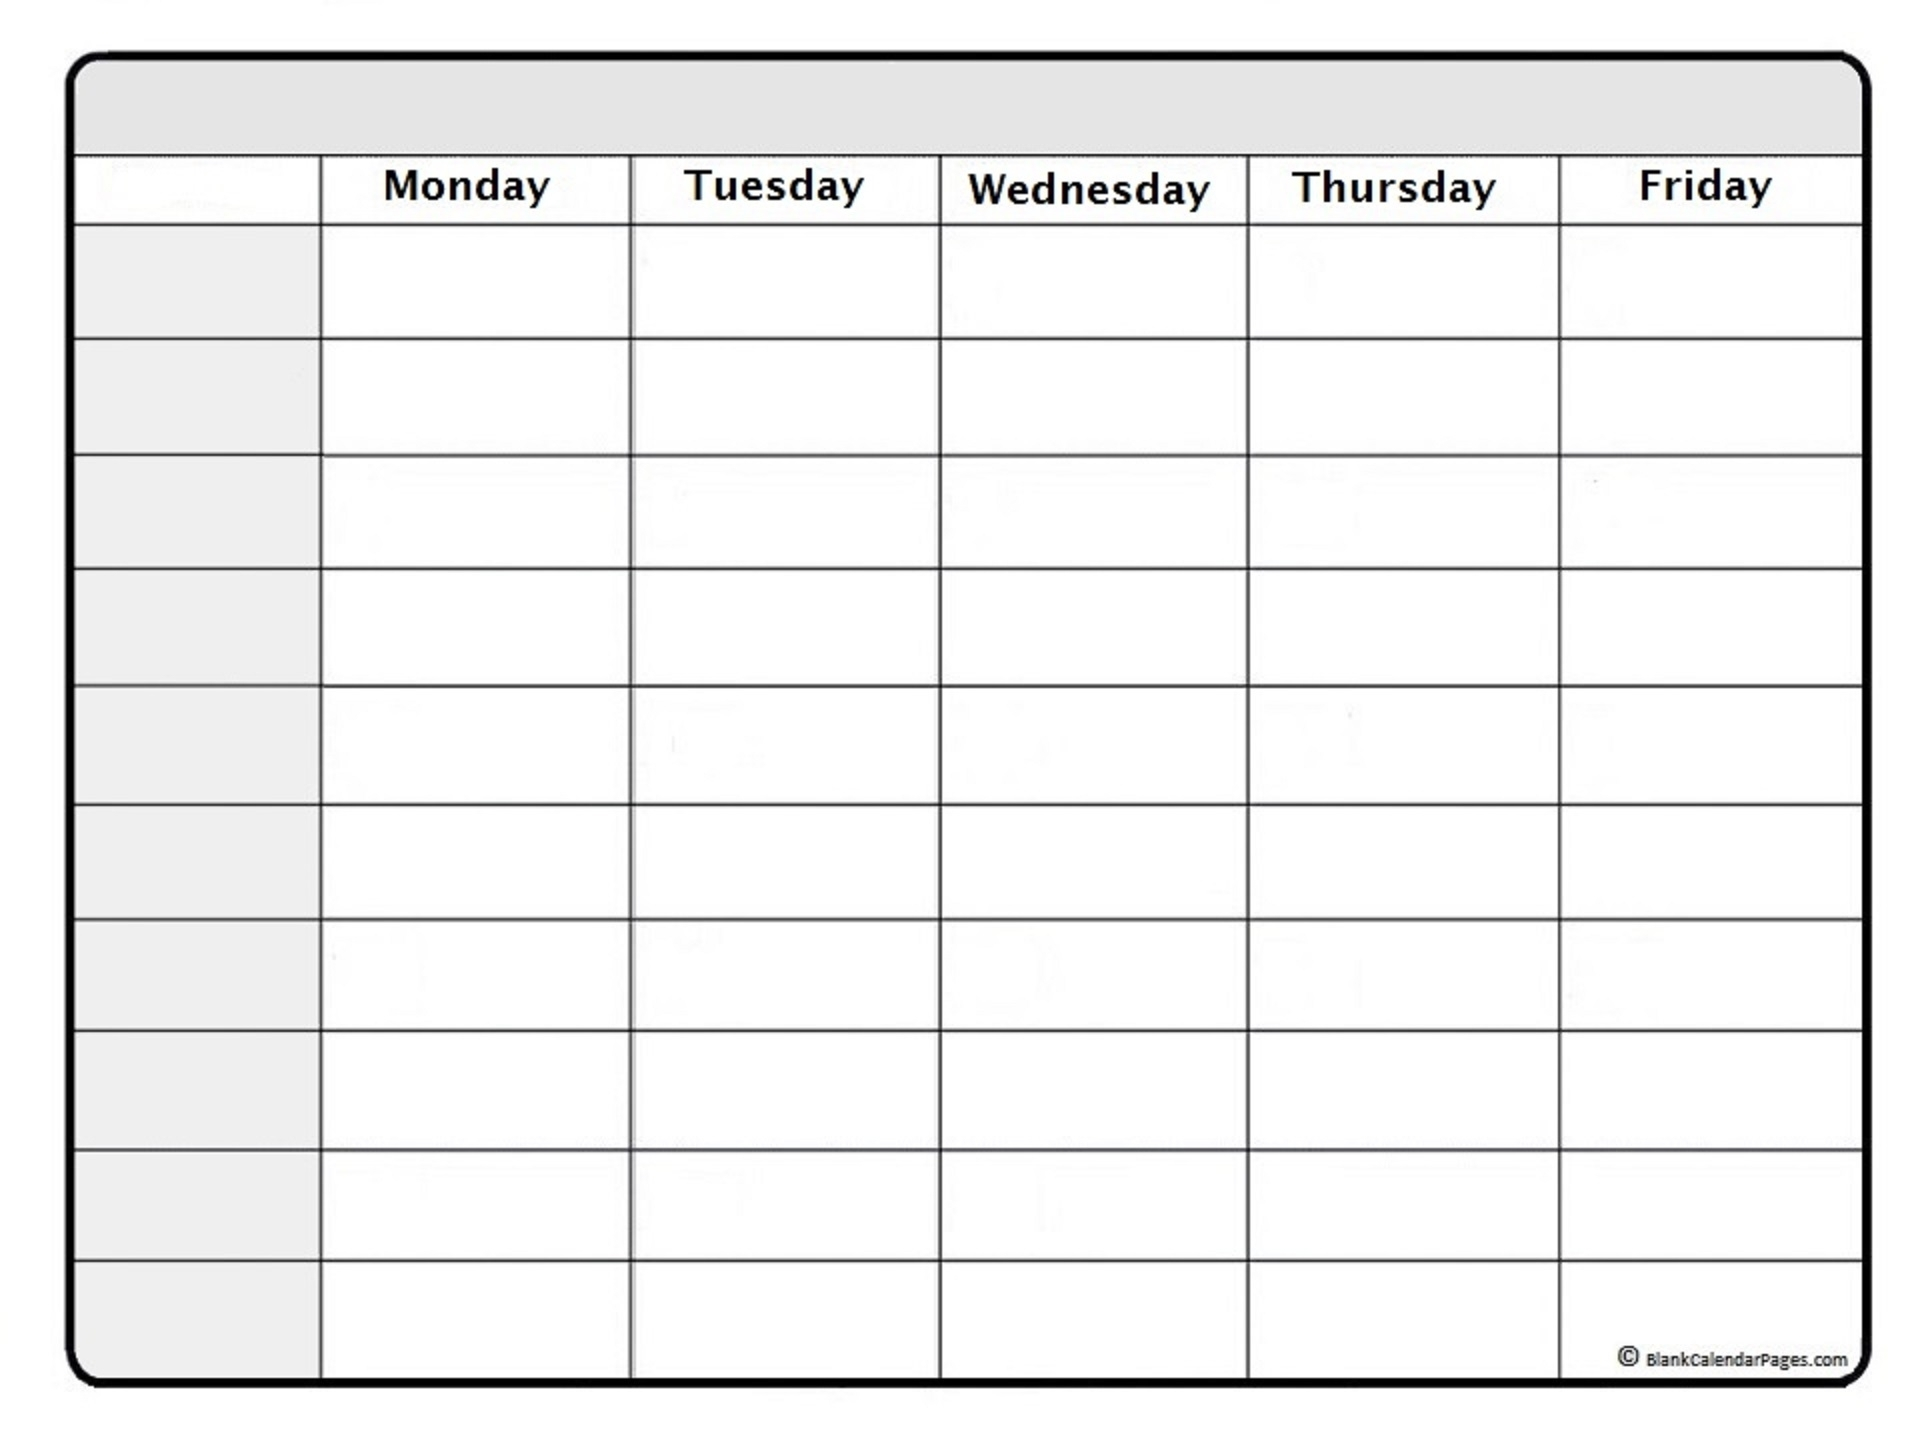 August 2020 Weekly Calendar | August 2020 Weekly Calendar regarding 2020 Calendar Format Monday Through Friday Week